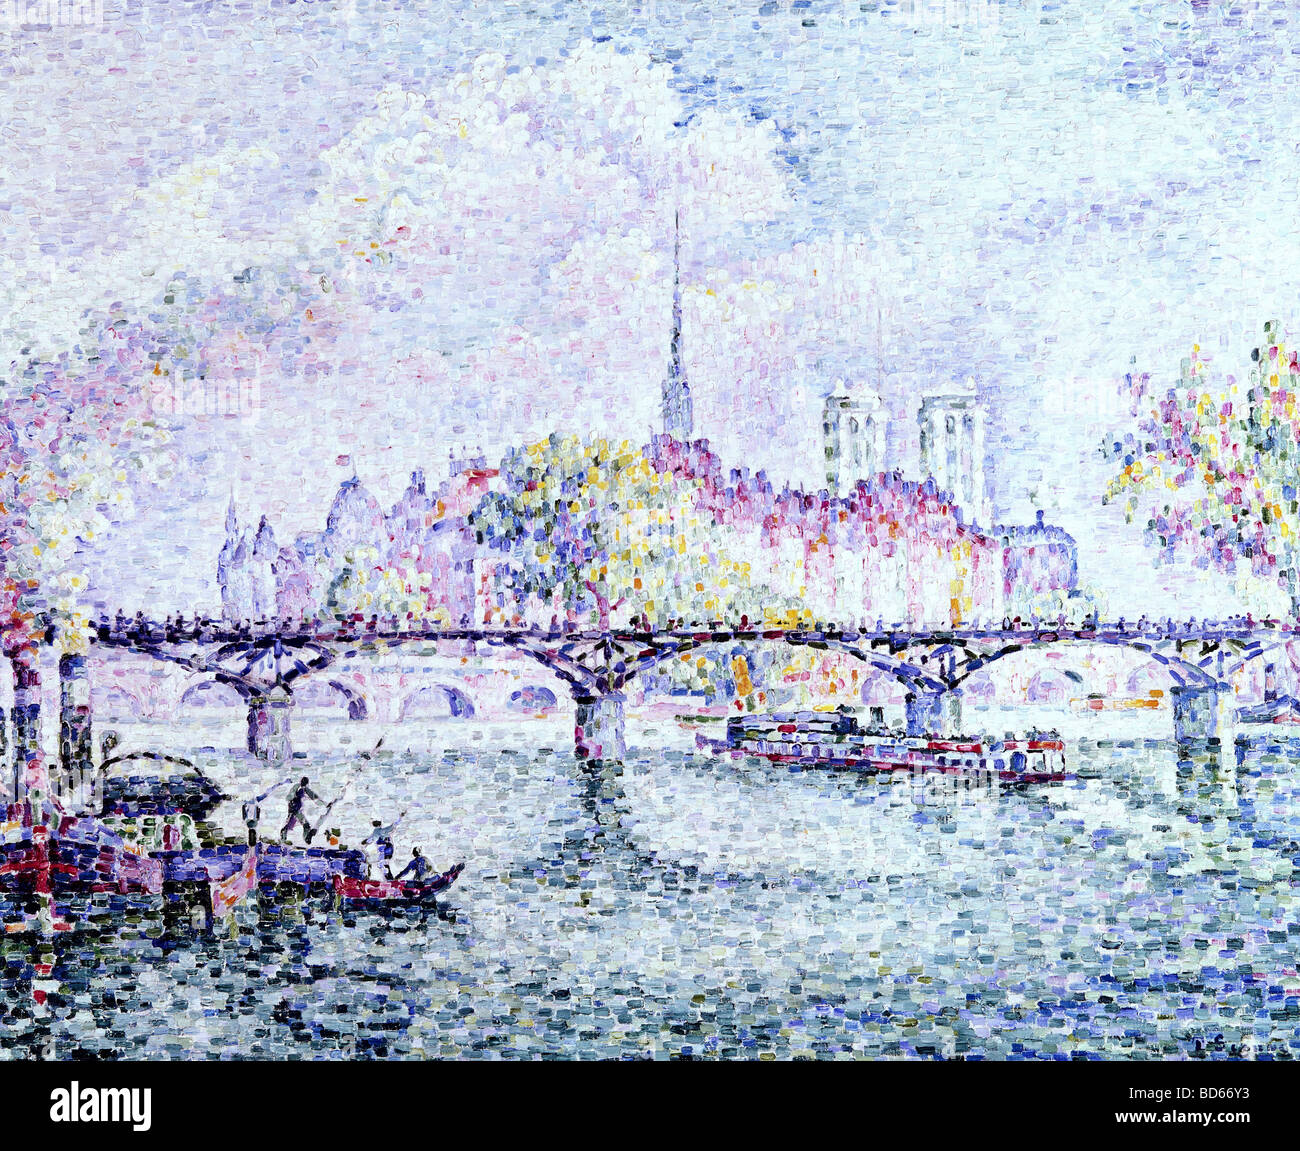 "Bildende Kunst, Signac, Paul, (1863-1935), Malerei, ""Paris, Ile De La Cite"", 1912, Öl auf Leinwand, Stockbild"